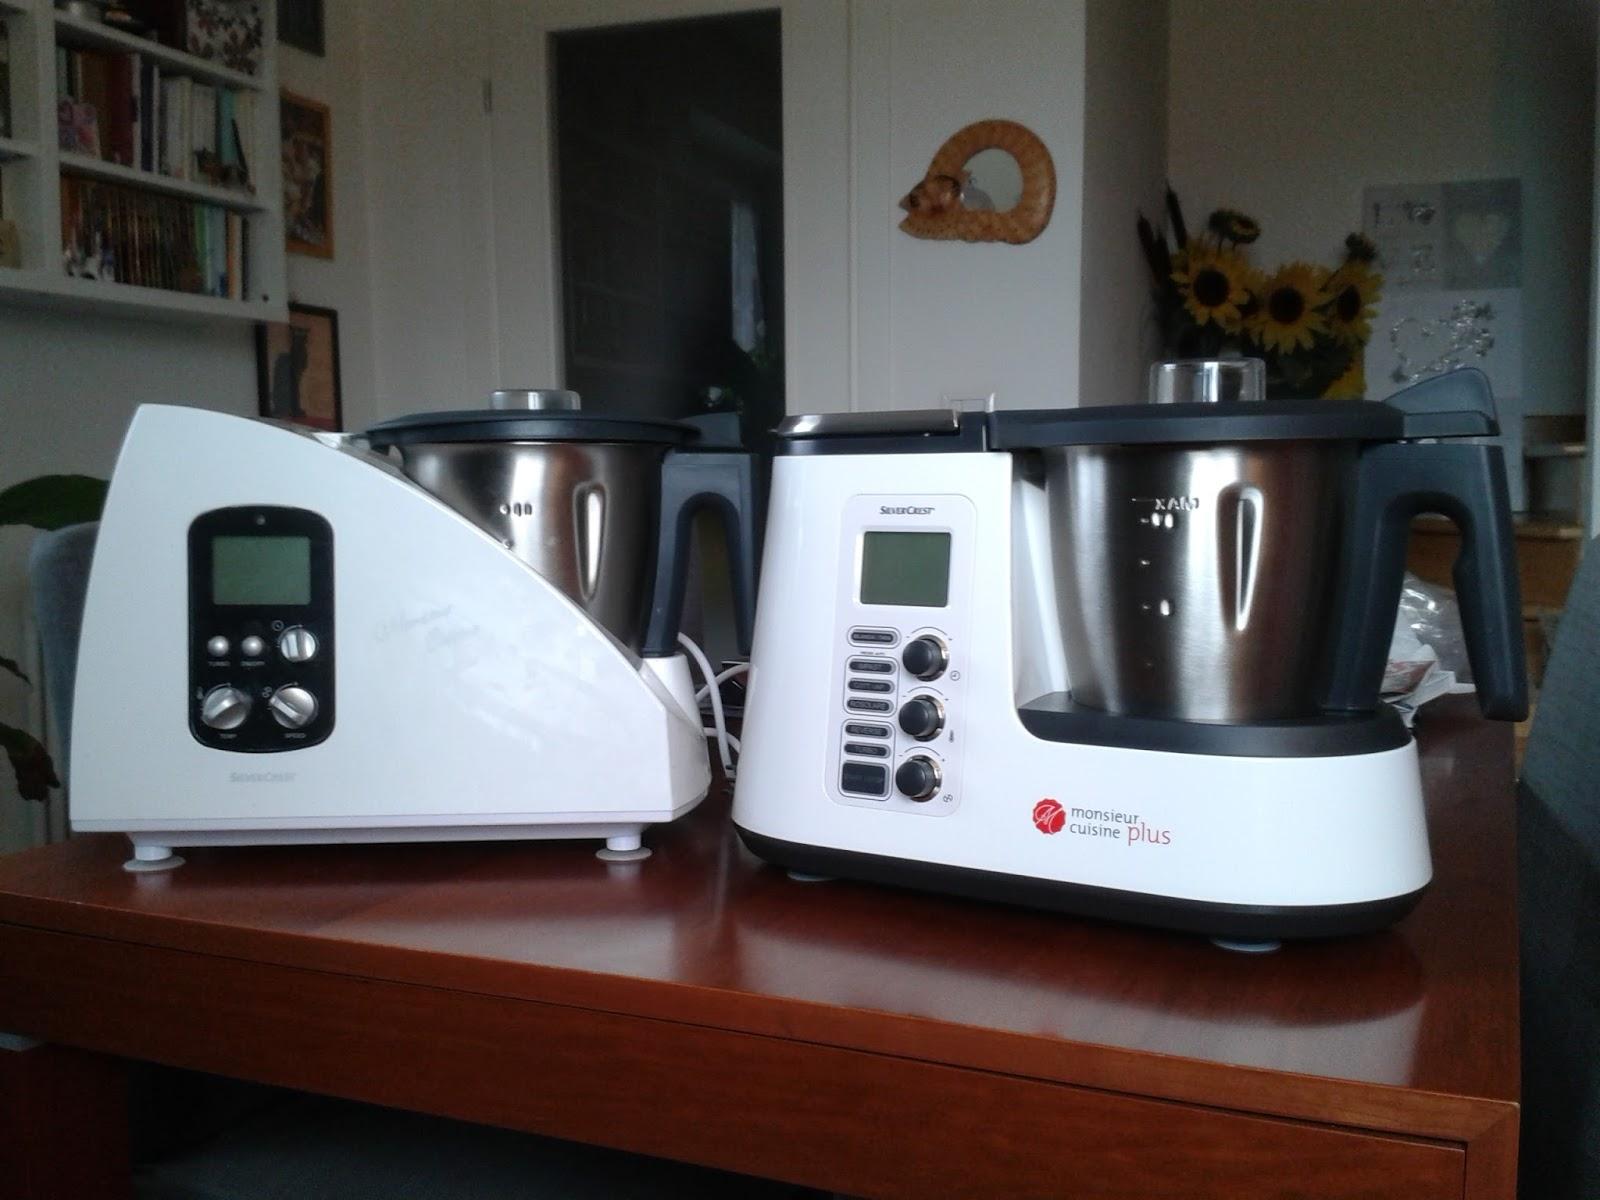 Le stanze di azzurra doppietta moncu monsieur cuisine for Robot monsieur cuisine plus